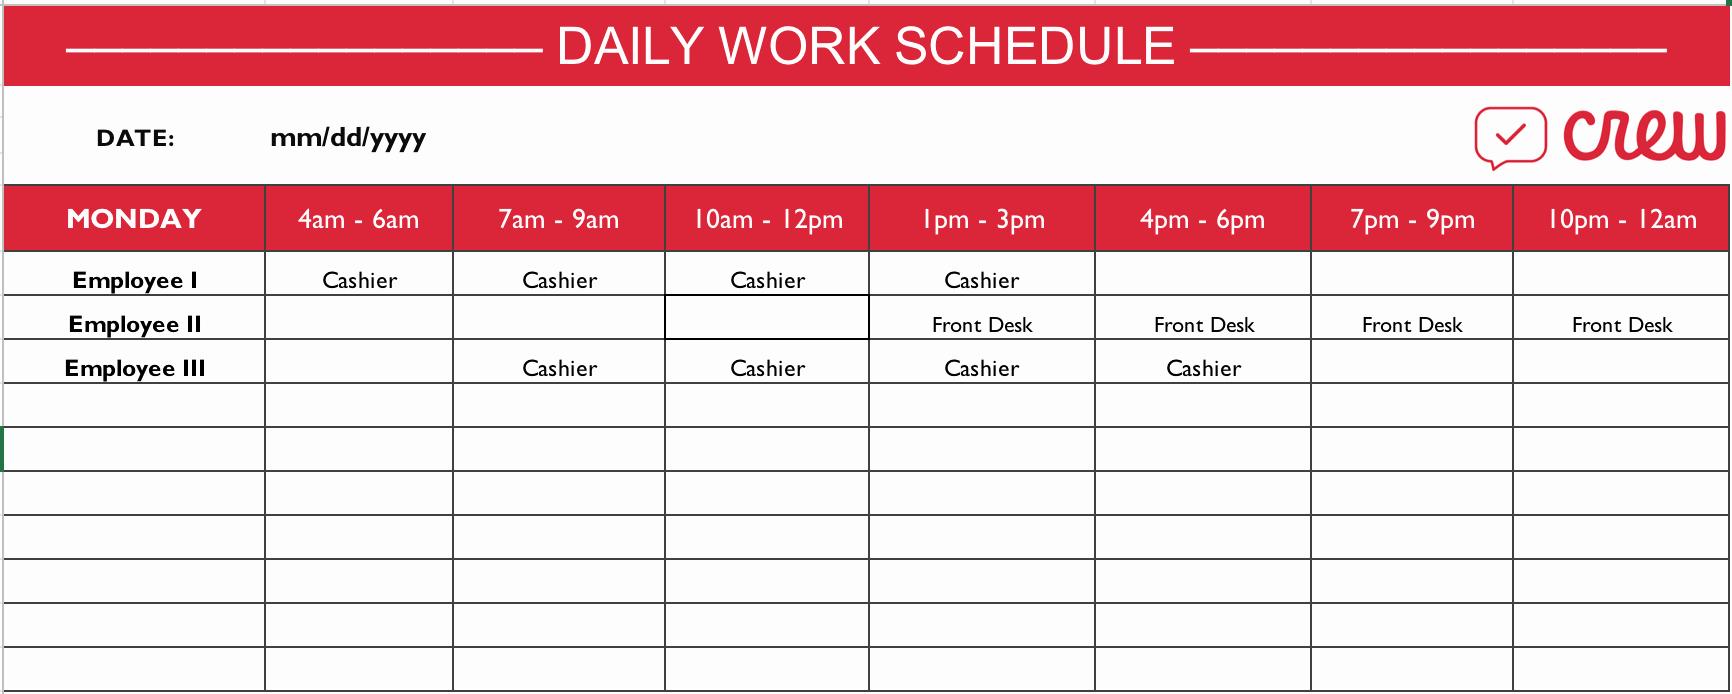 Work Schedule Calendar Template Elegant Free Daily Work Schedule Template Crew